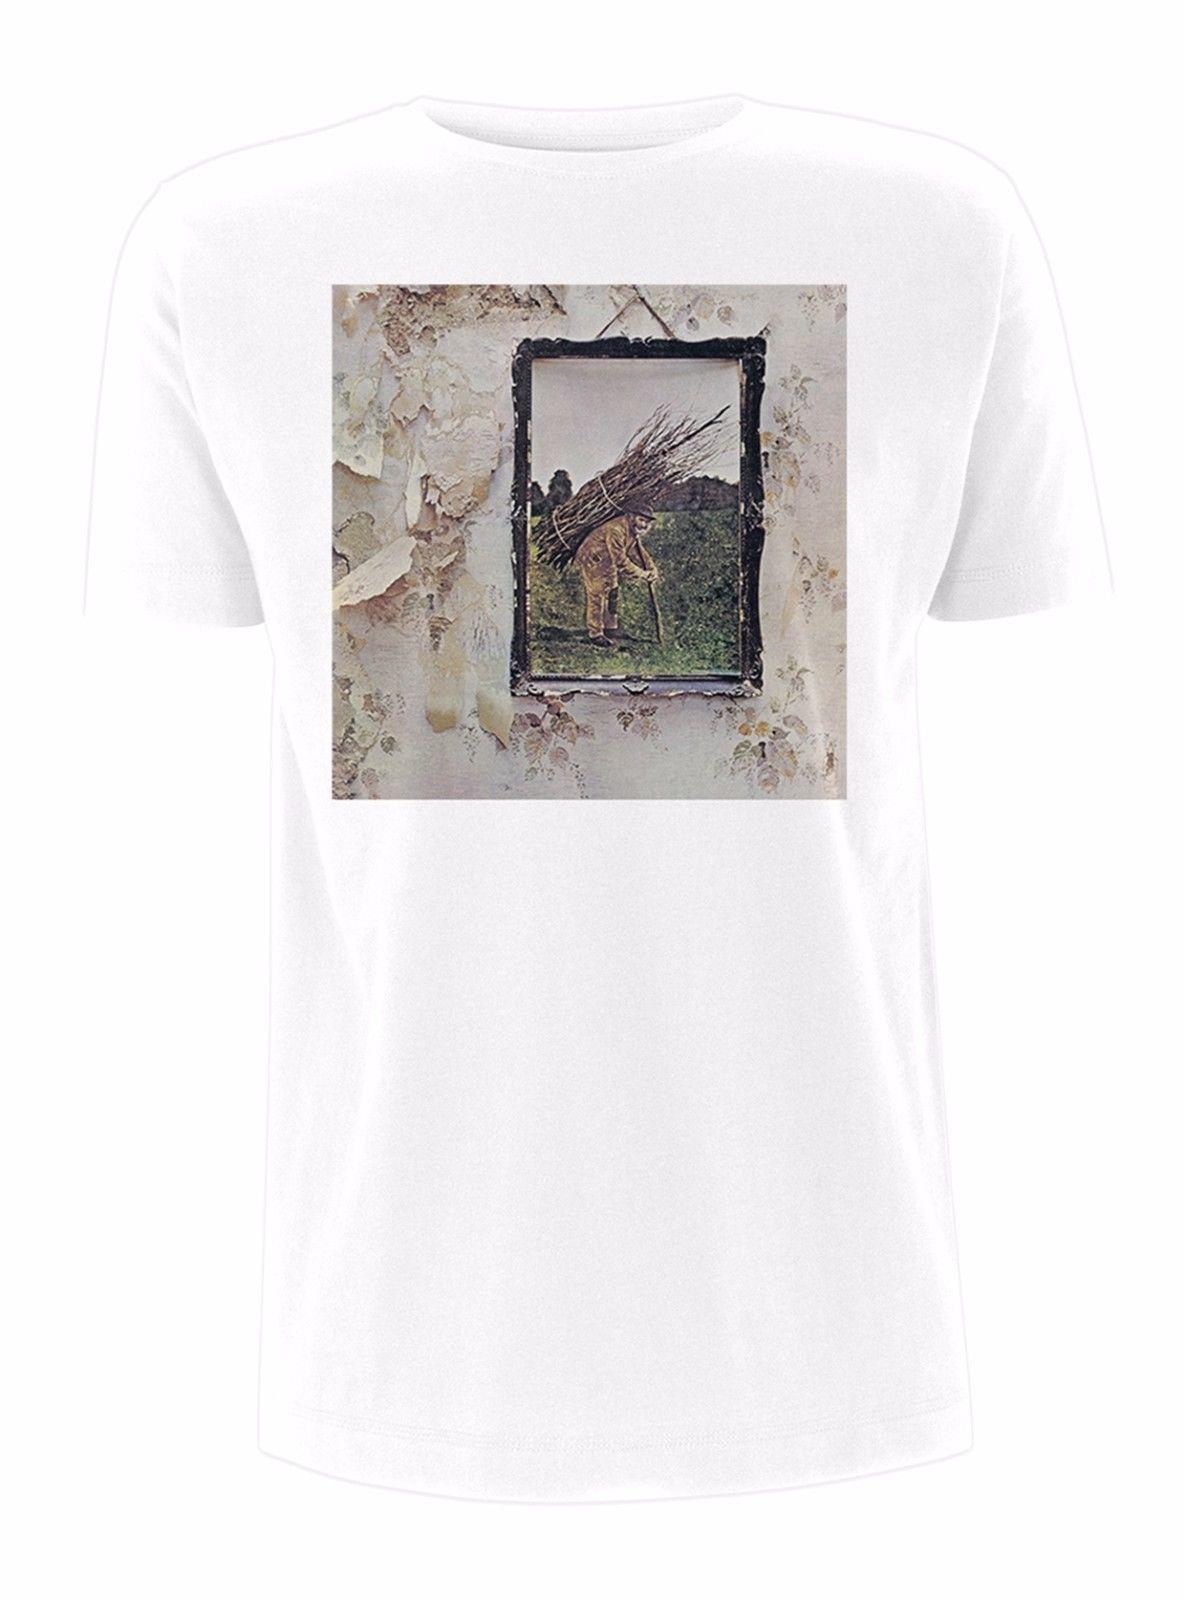 98cc9eaad Led Zeppelin  IV Album Cover  T Shirt NEW Design Tee Shirts T Shirt Funny  From Bi4u